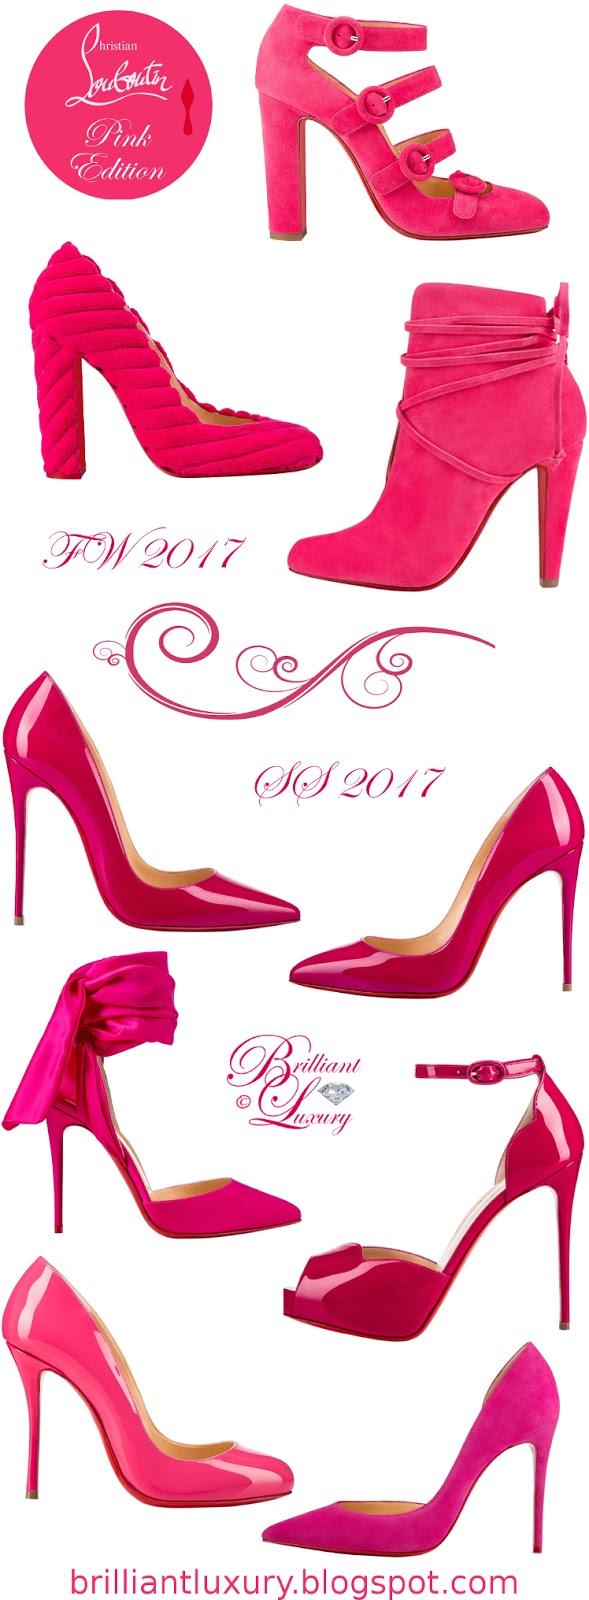 Brilliant Luxury ♦ Christian Louboutin Pink Edition